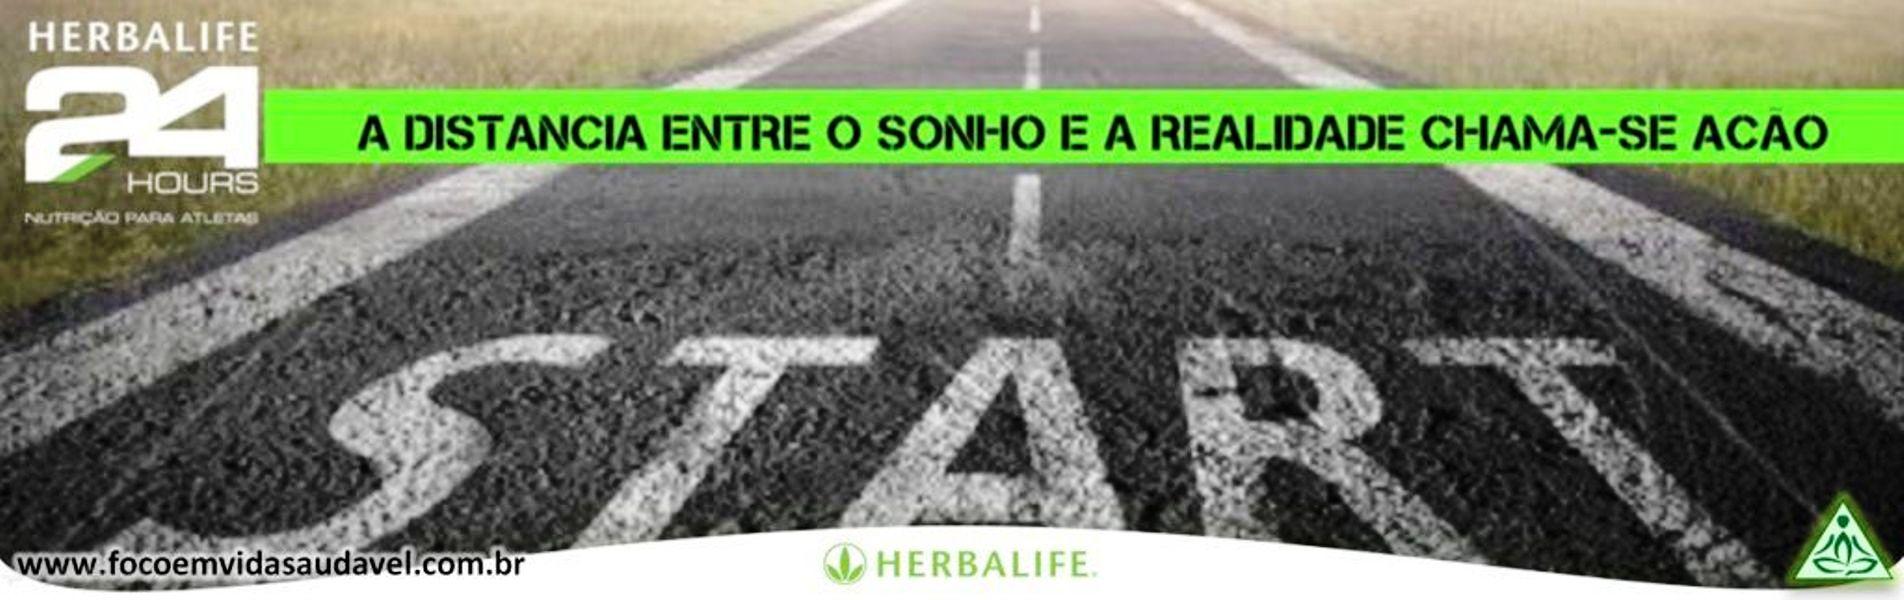 consultora-herbalife-foco-em-vida-ativa-e-saudavel-09